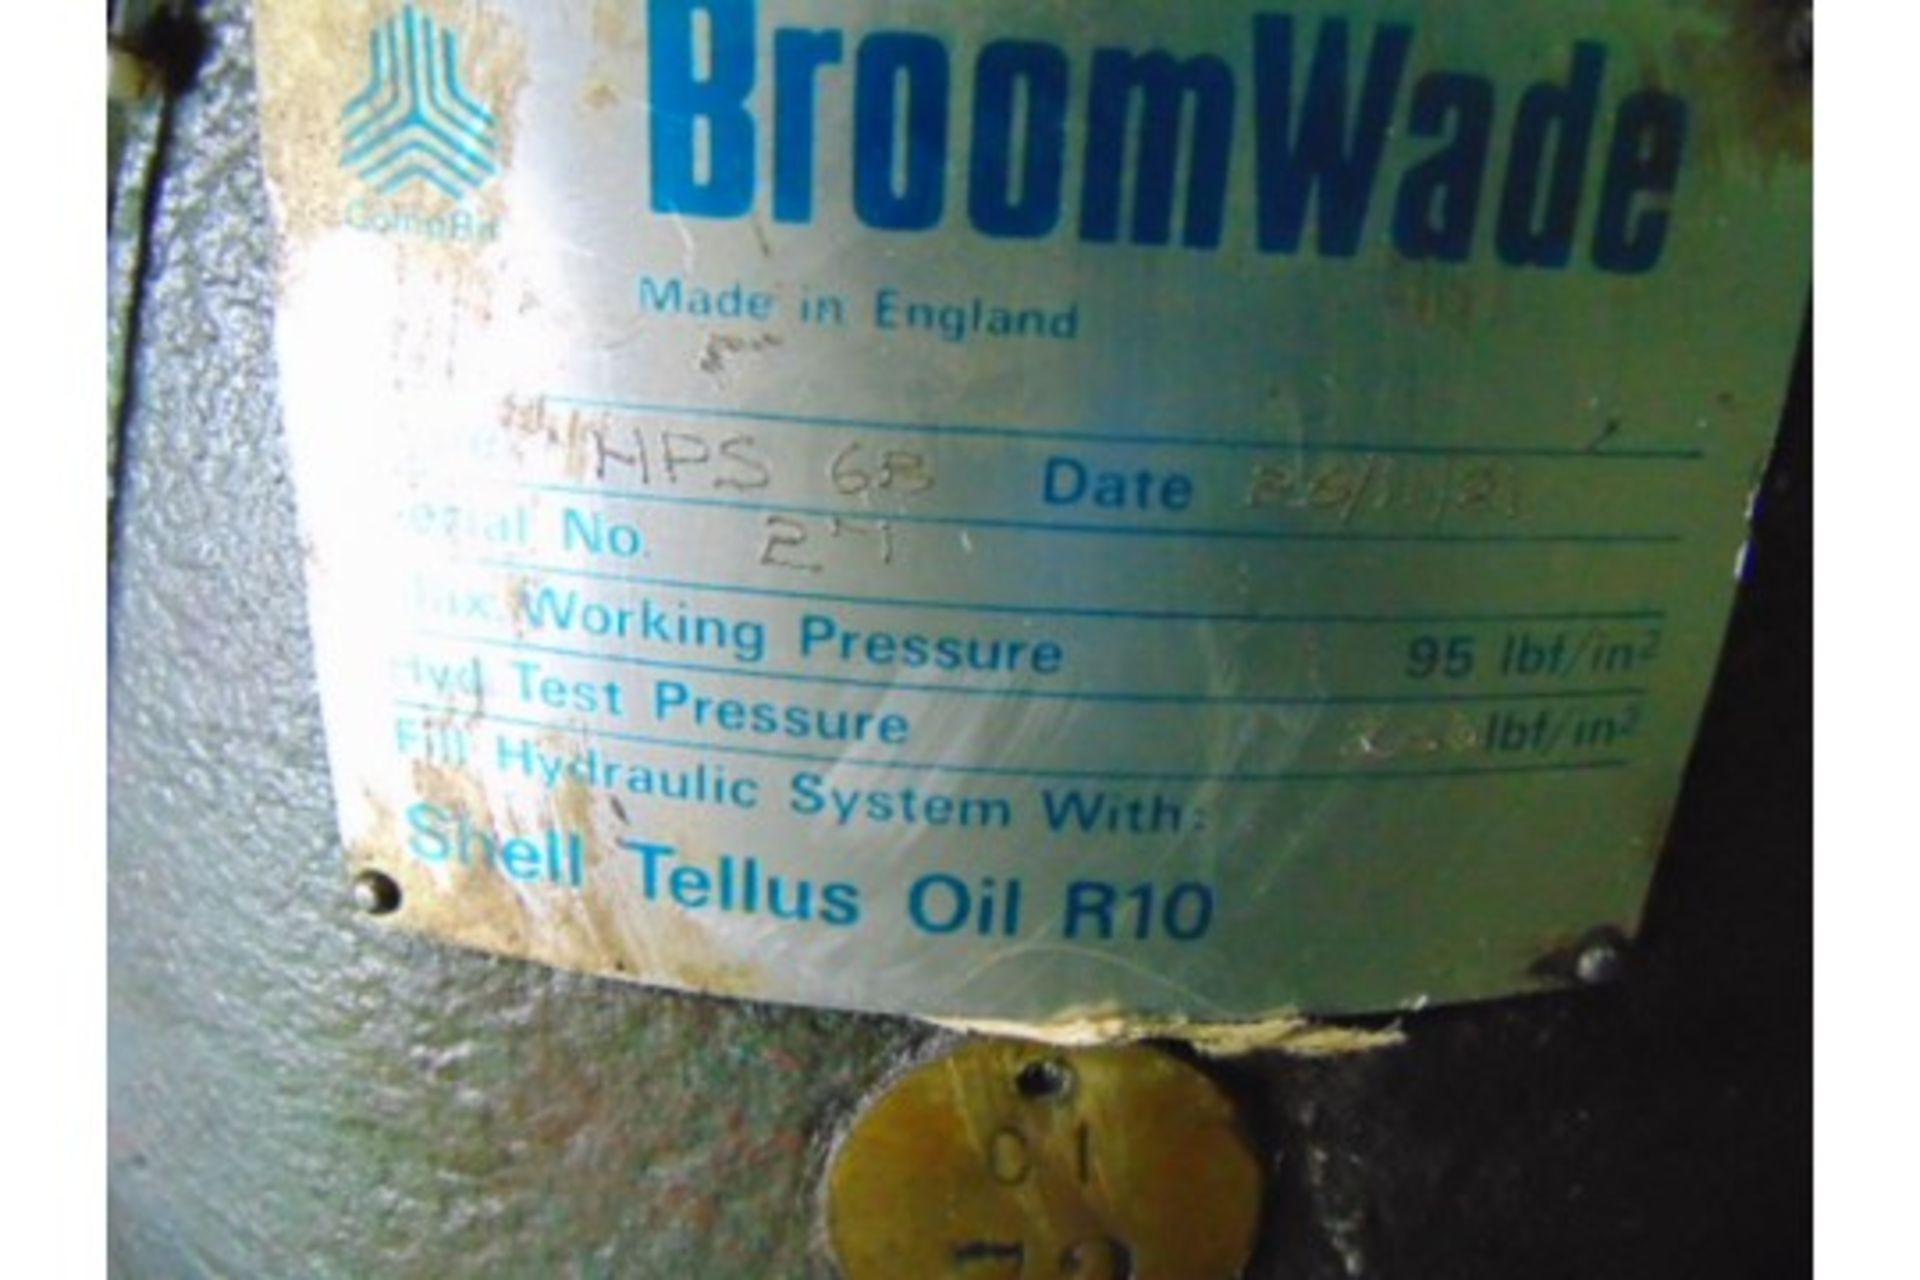 Lot 27207 - Broomwade HPS 6B Horizontal Pumping System